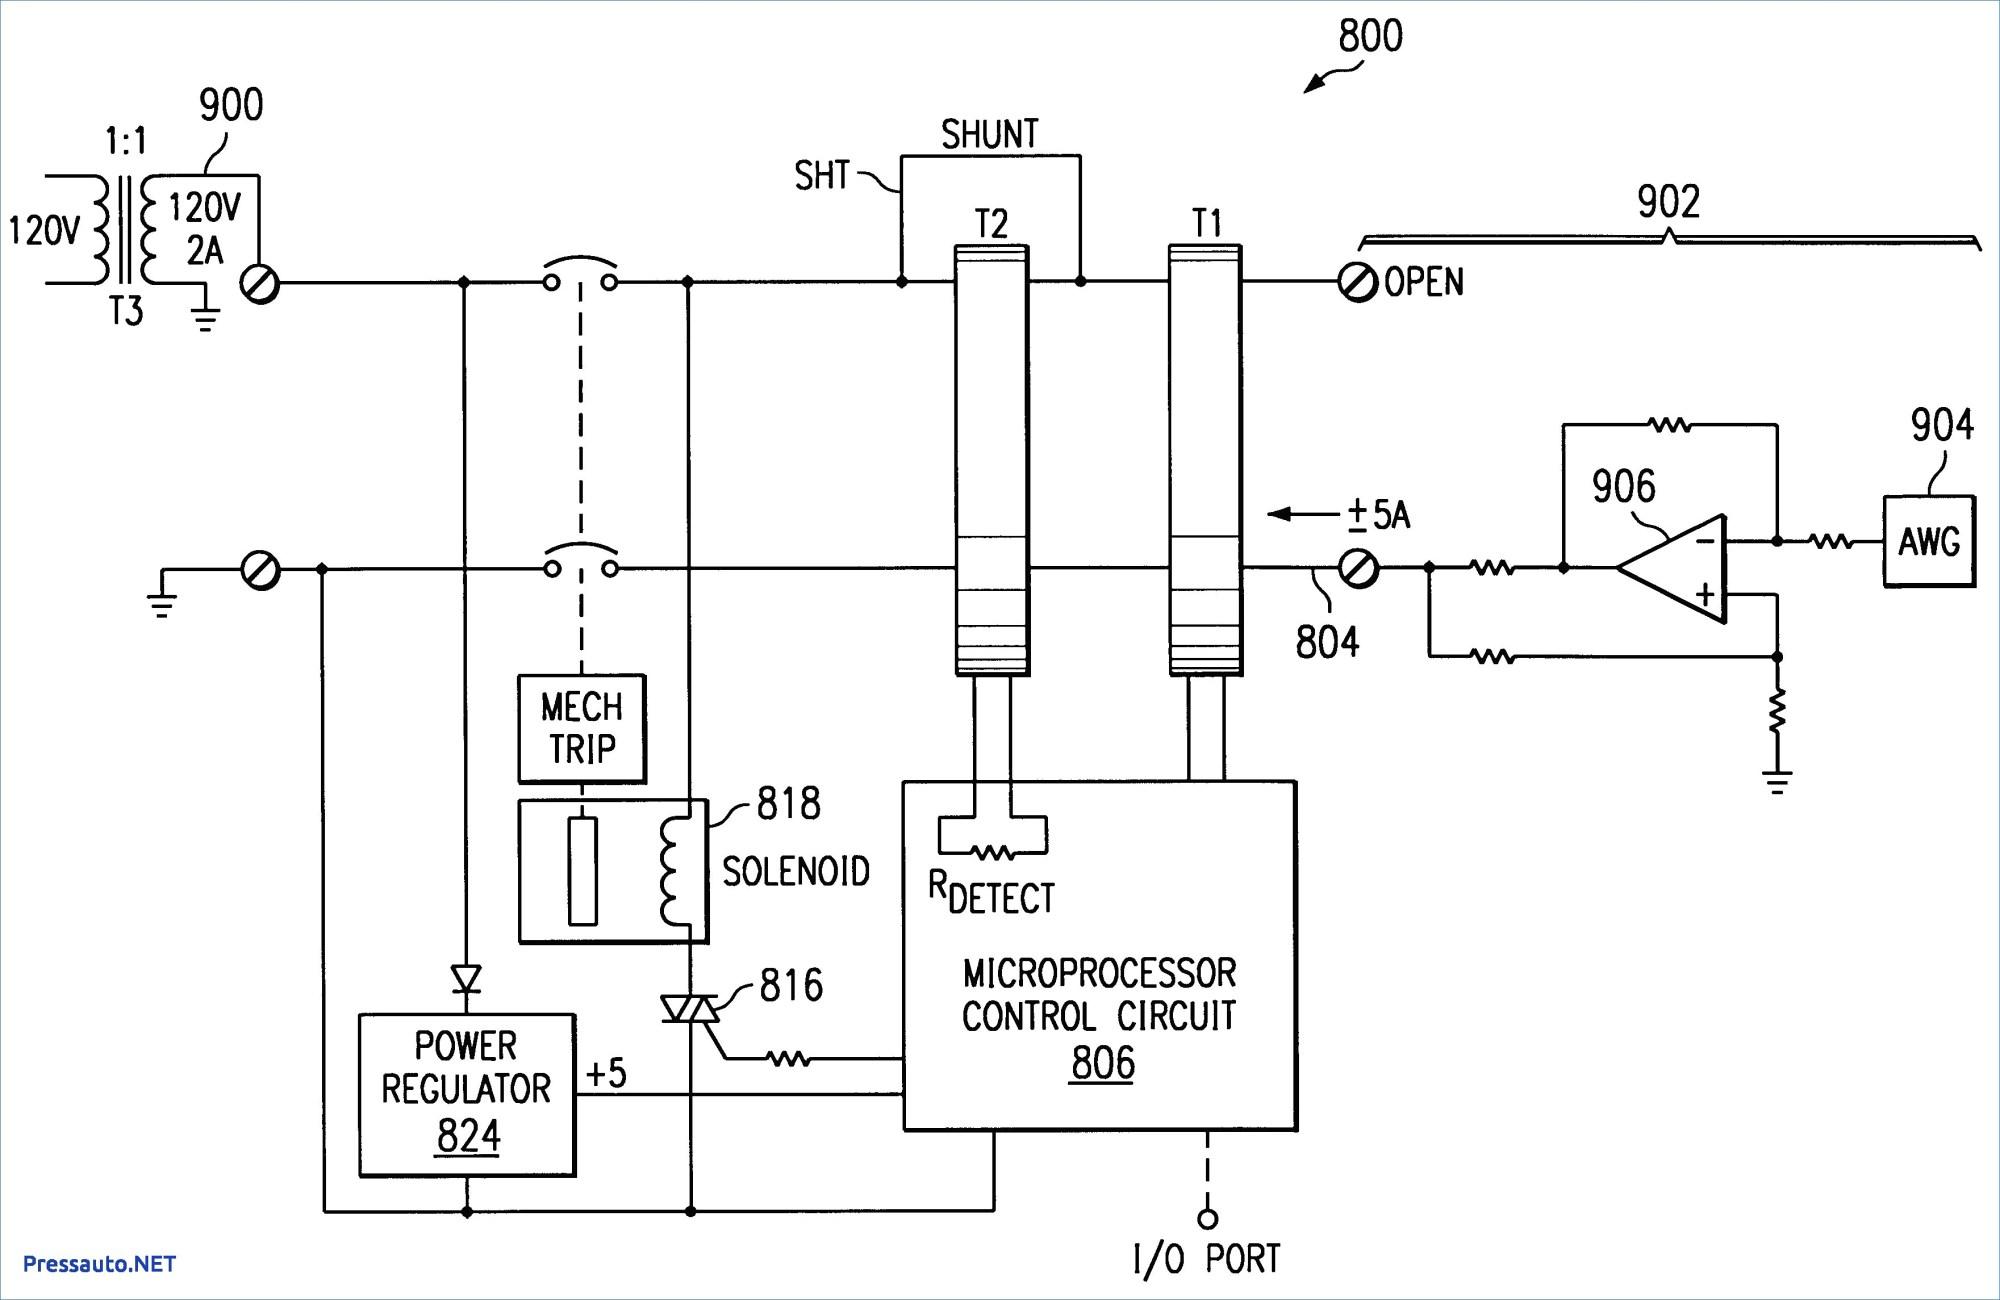 hight resolution of shunt trip wiring diagram square d download circuit breaker diagram fresh wiring diagram shunt trip download wiring diagram